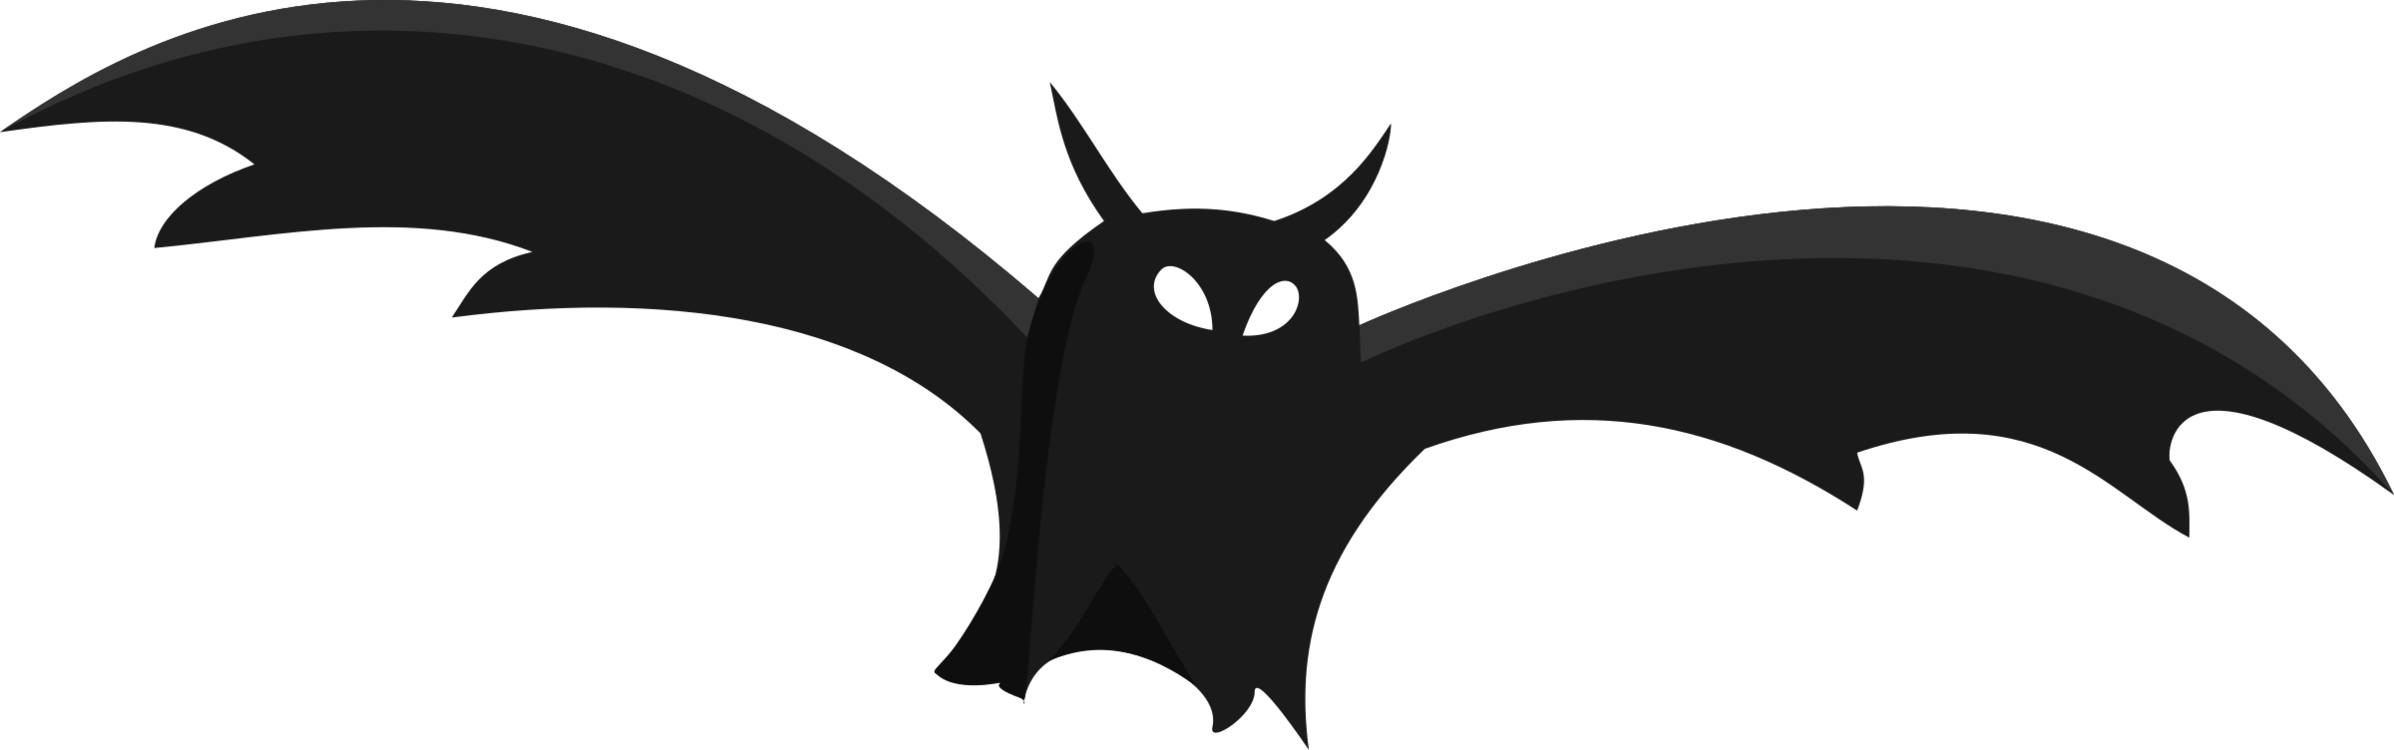 Bat,Silhouette,Monochrome Photography